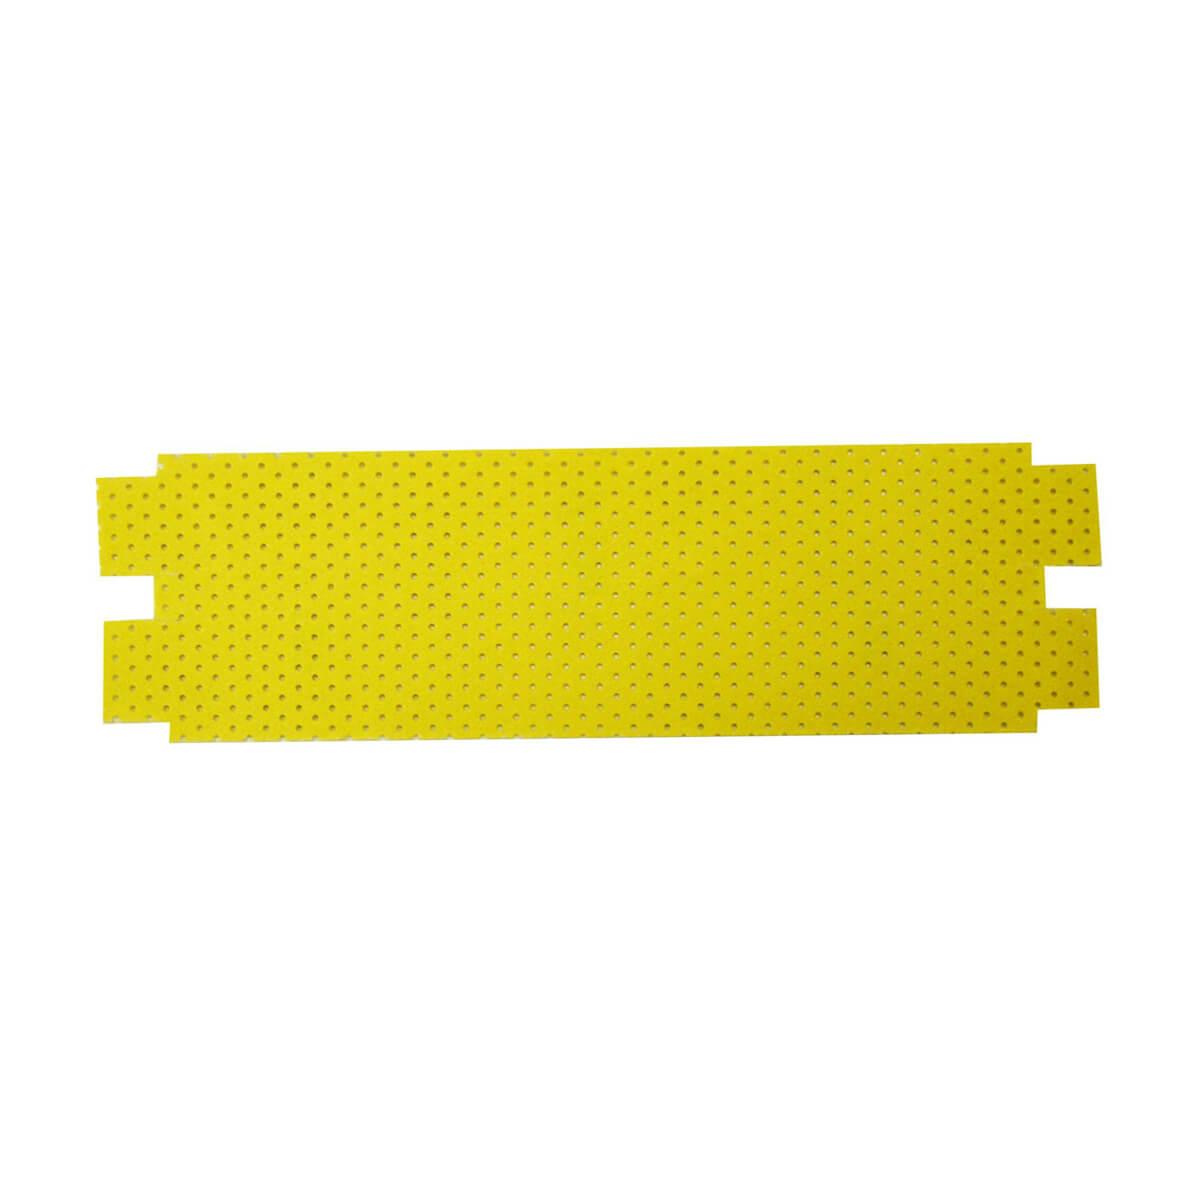 Perforated Drywall Sandpaper - Grit 180 - 2 Pack